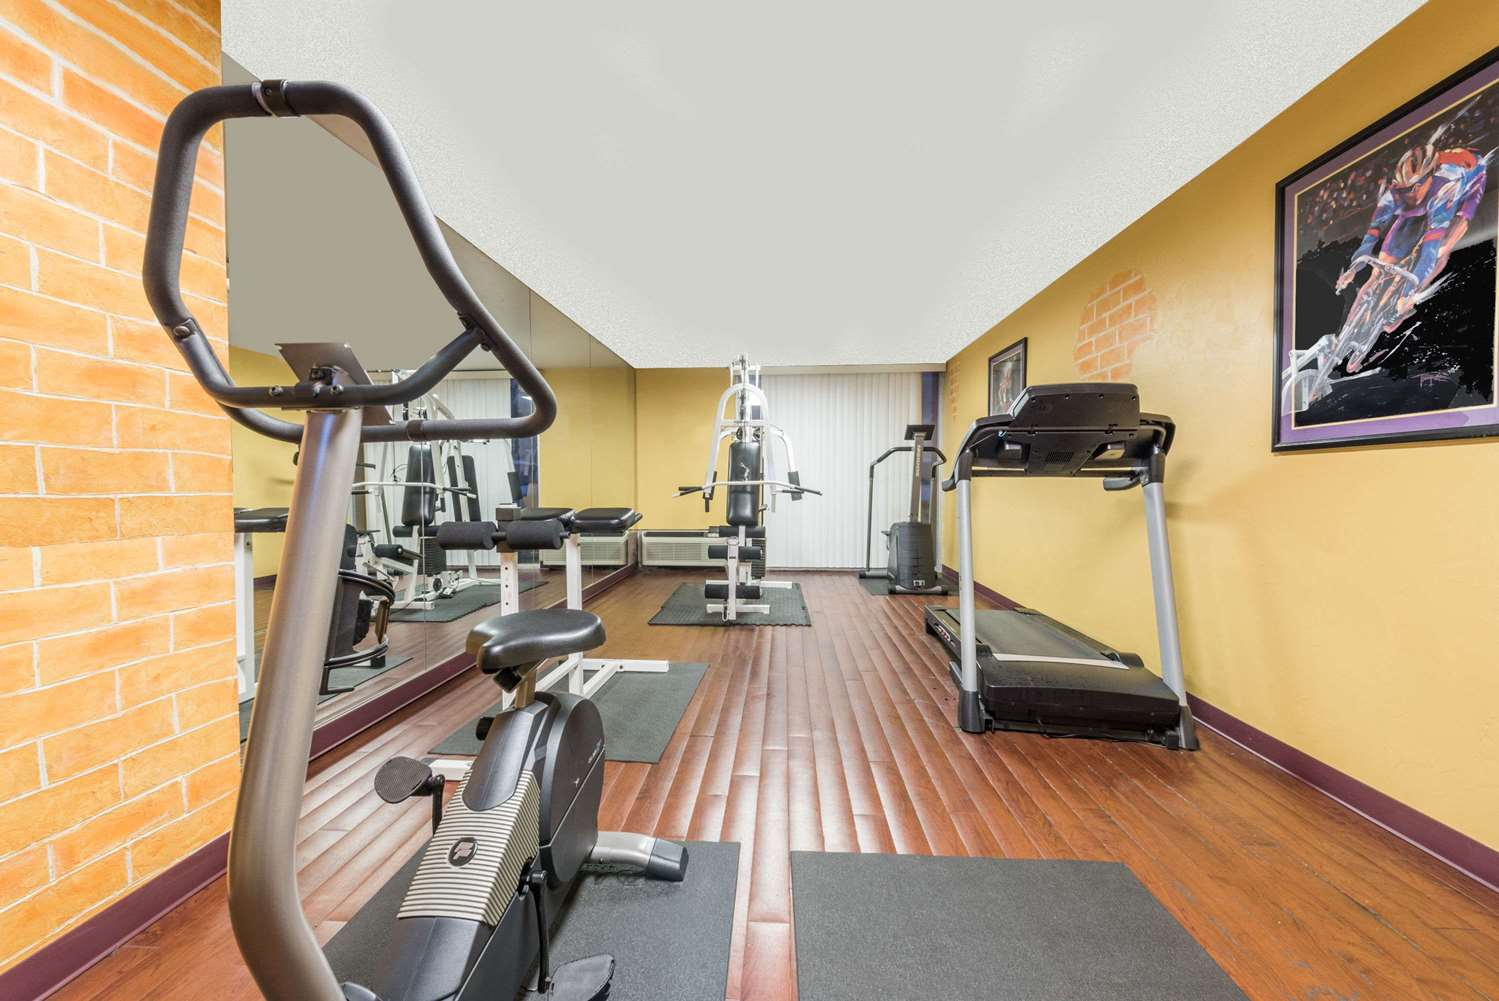 Fitness/ Exercise Room - Ramada Inn Love Field Dallas